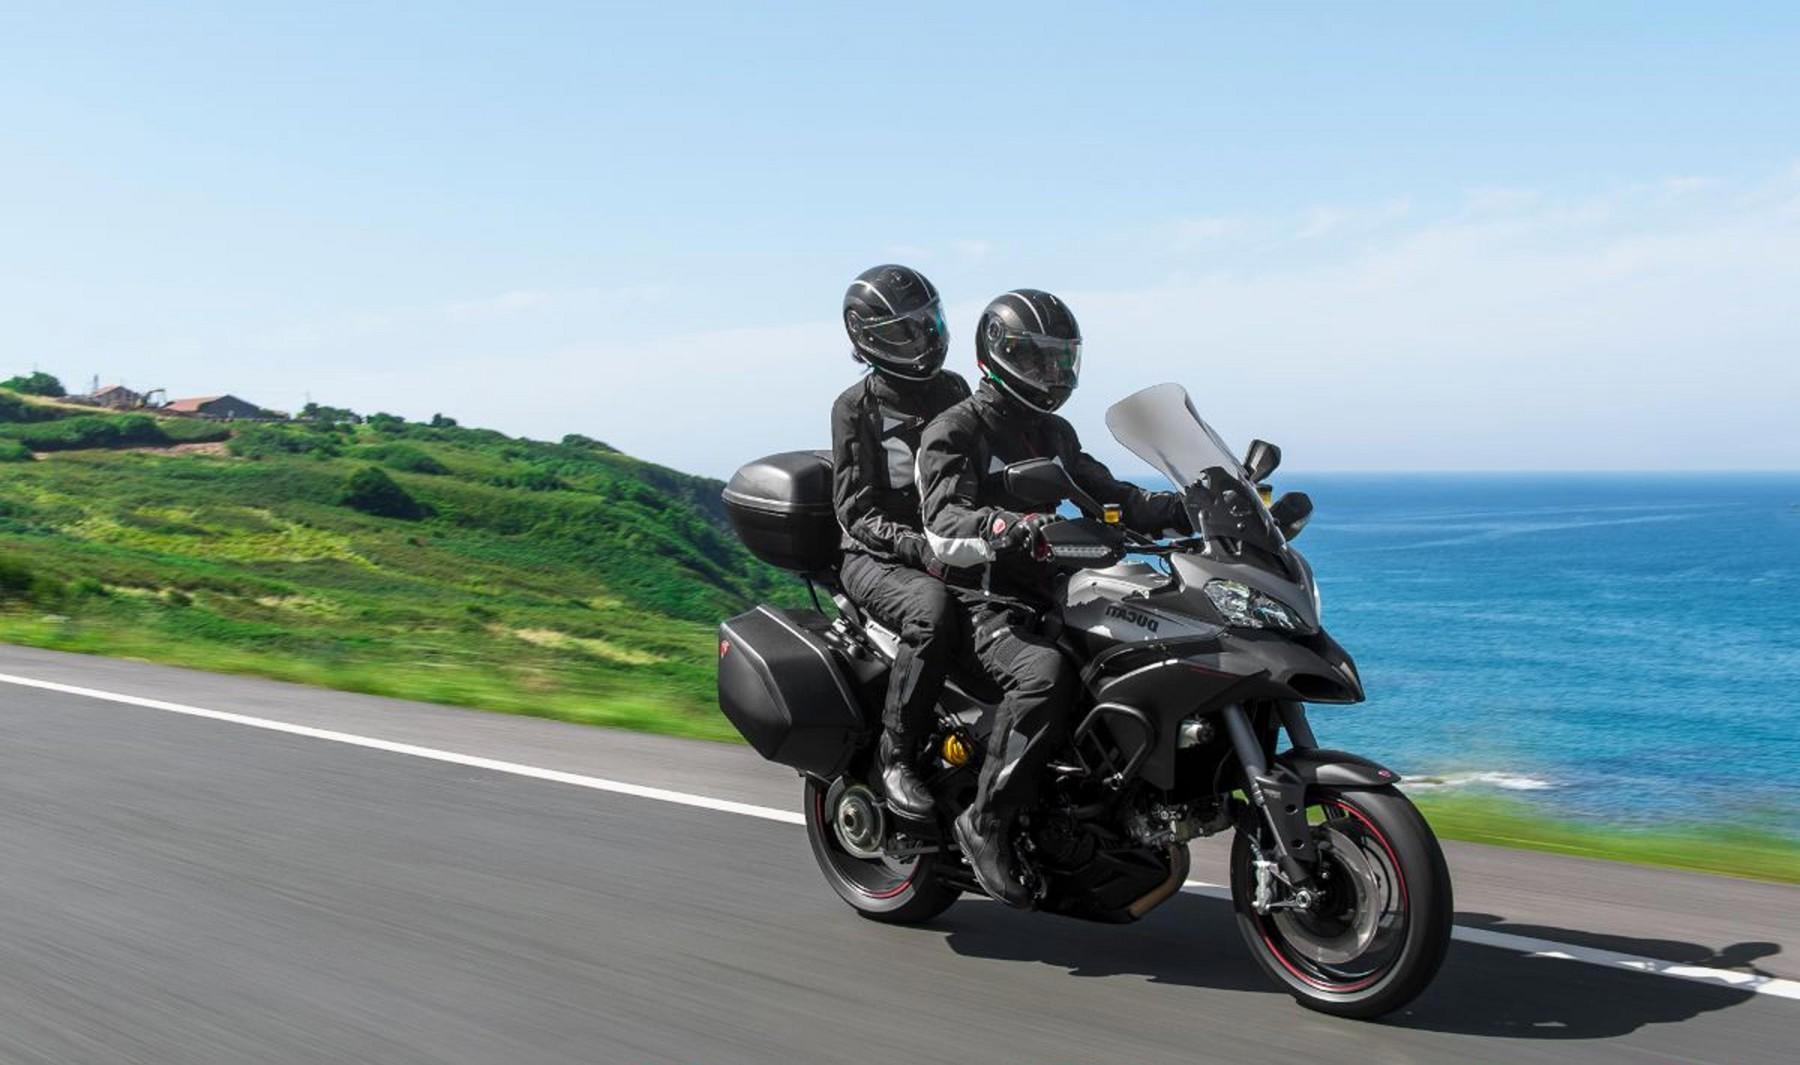 2013-Ducati-Multistrada-1200-S-Granturismo-Engine